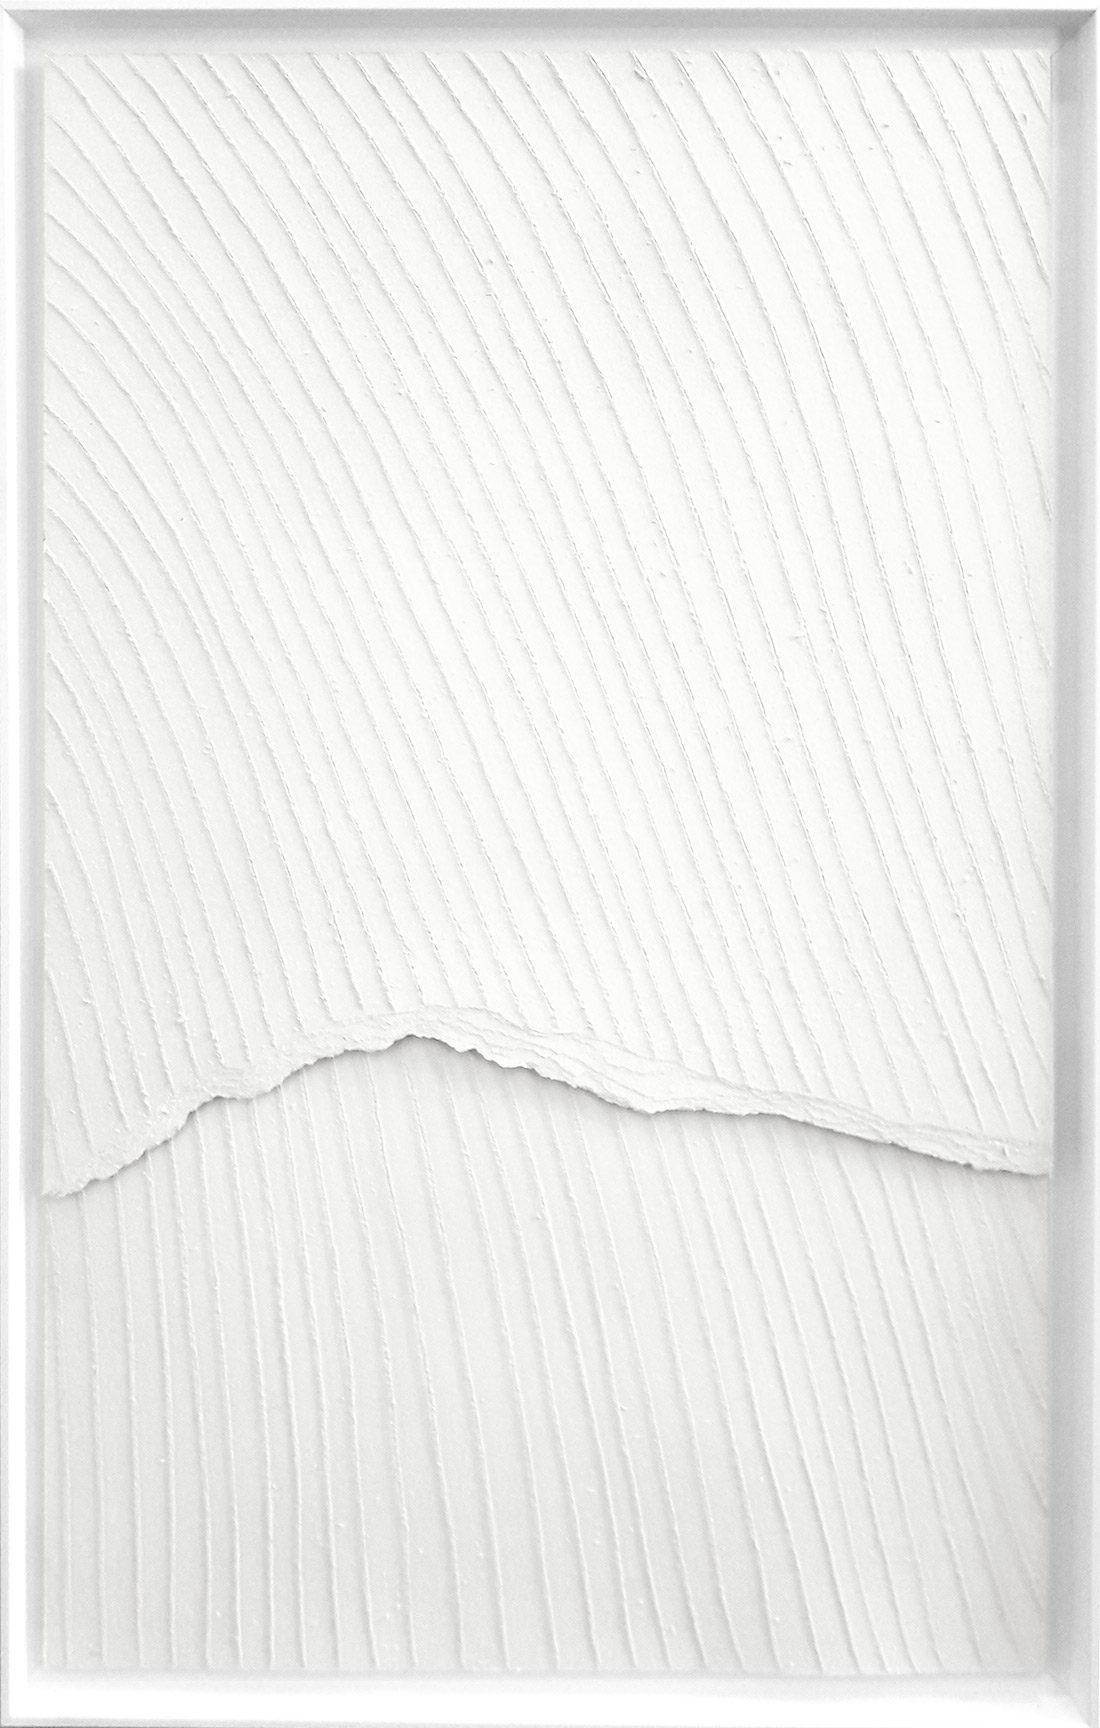 Bernard Gortais - Oeuvre sur papier - Continuum 161